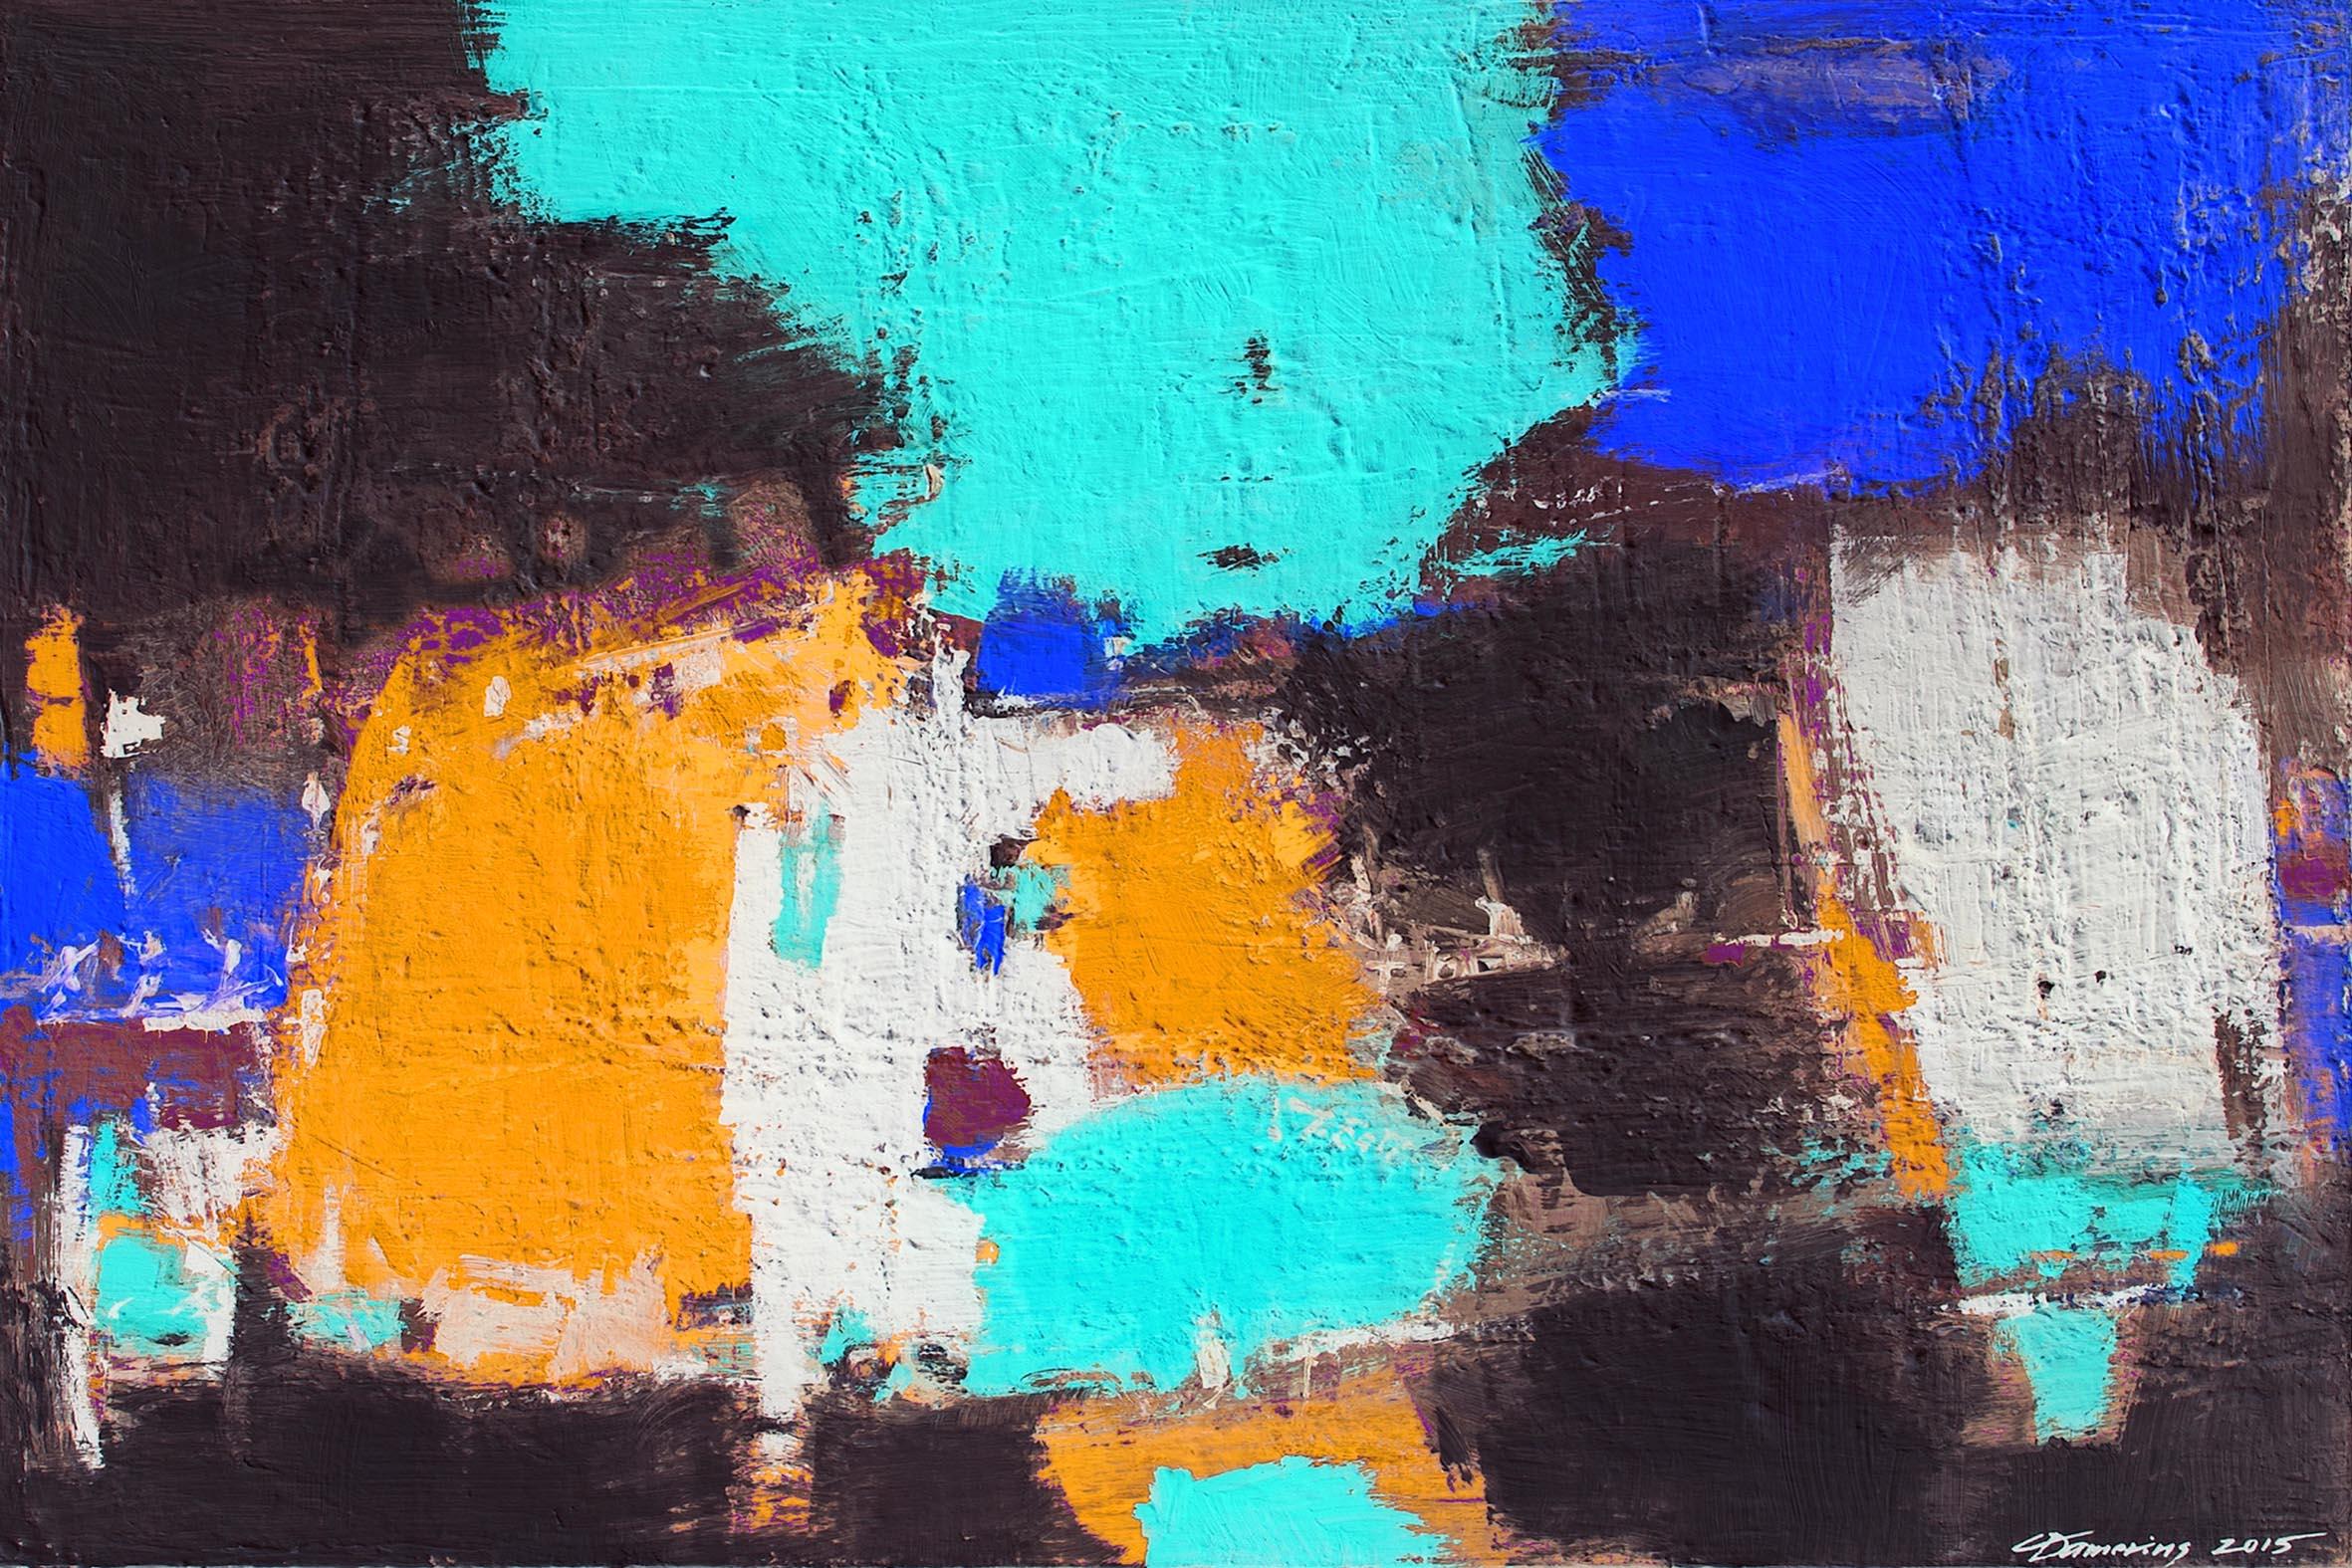 Christian damerius abstraktes abstraktion kunstdrucke mit rahmen leinwanddrucke hamburg reinbek - Abstrakte kunstdrucke ...